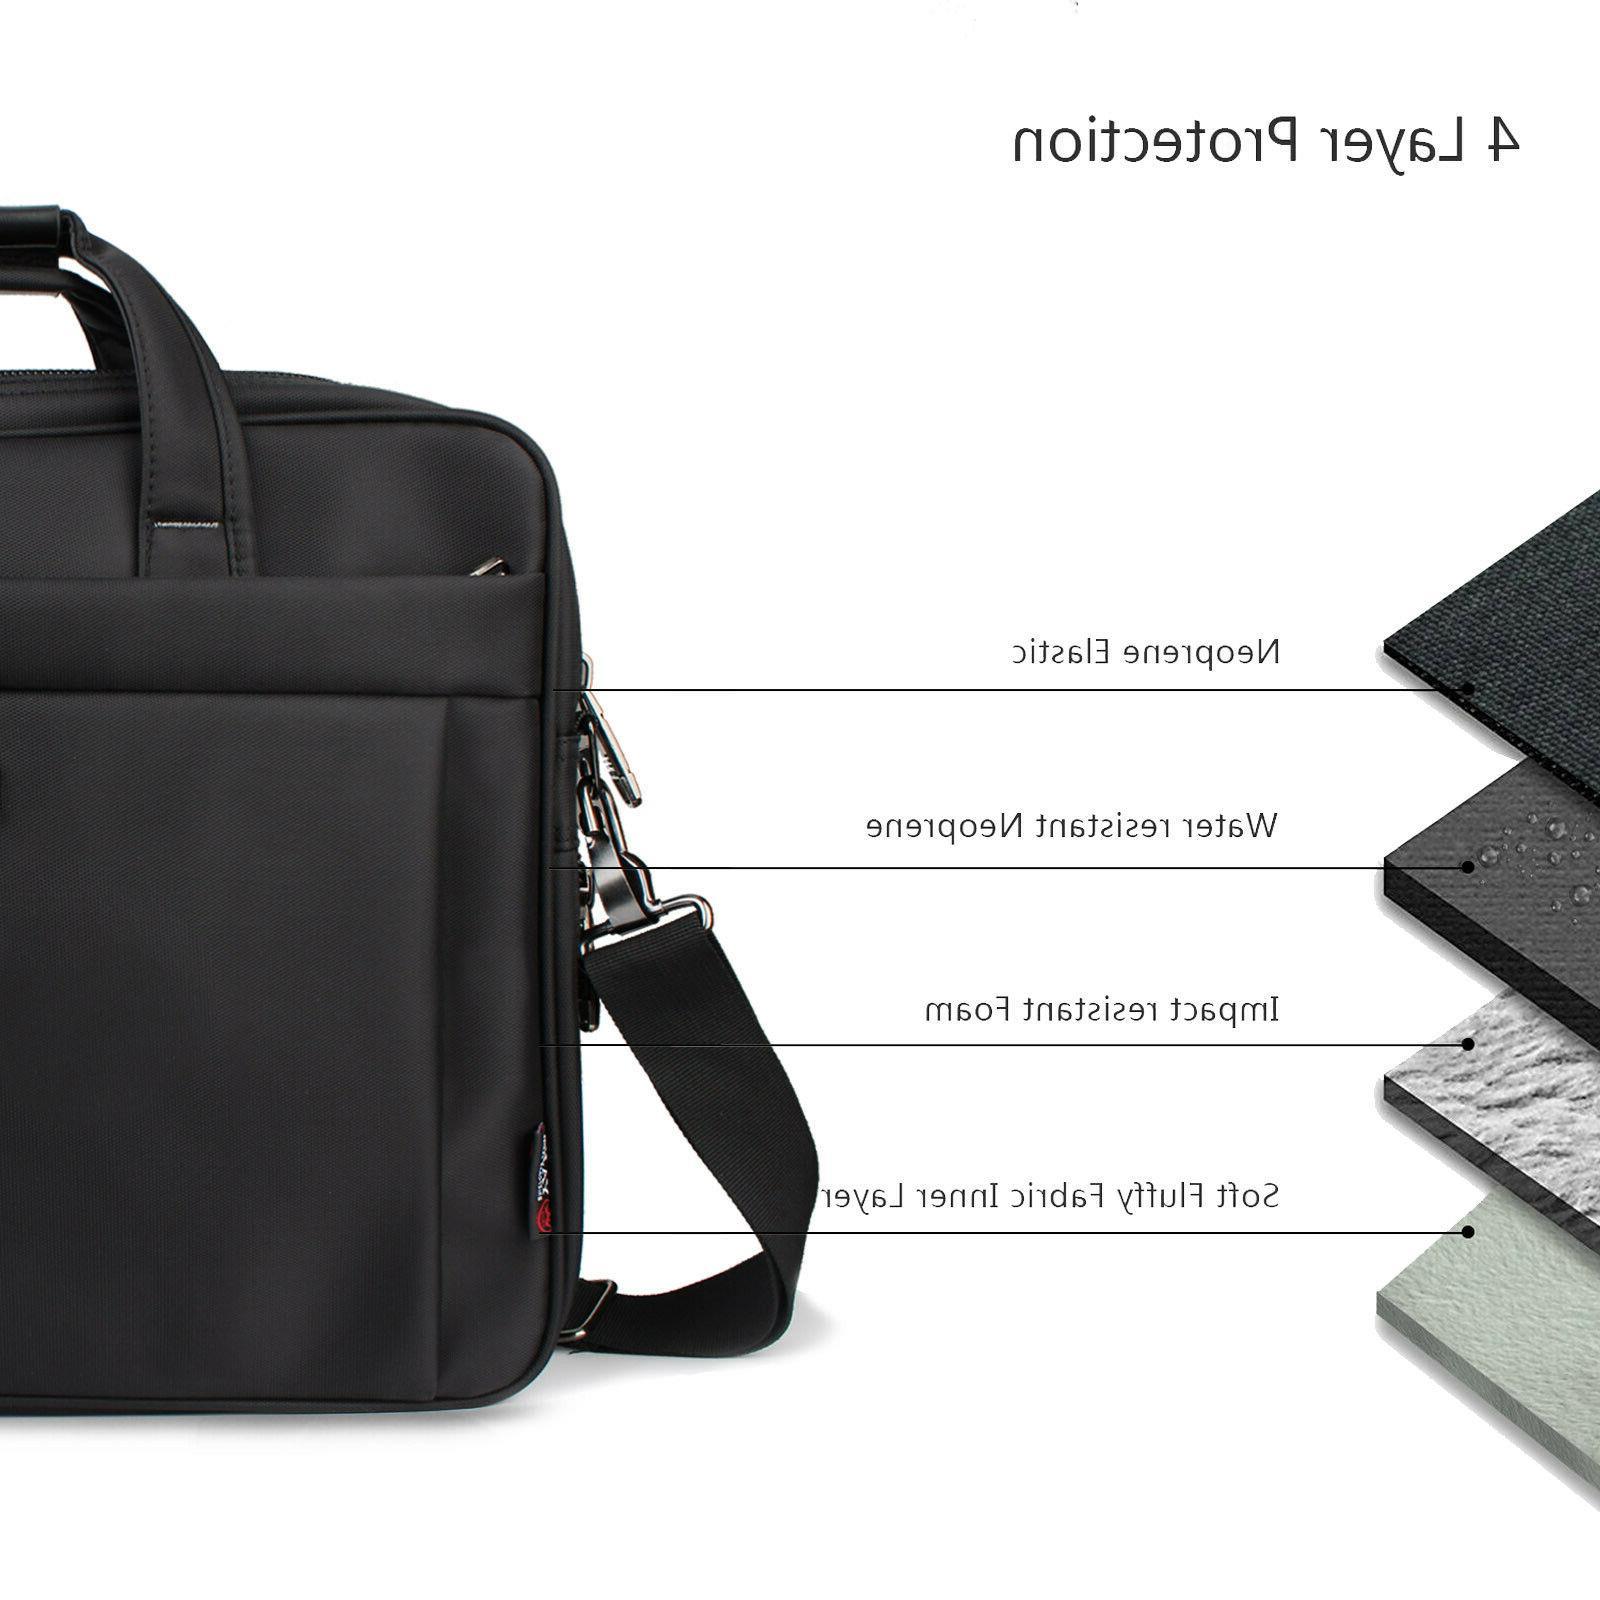 【13 Air & Pro Bag - Sleeve